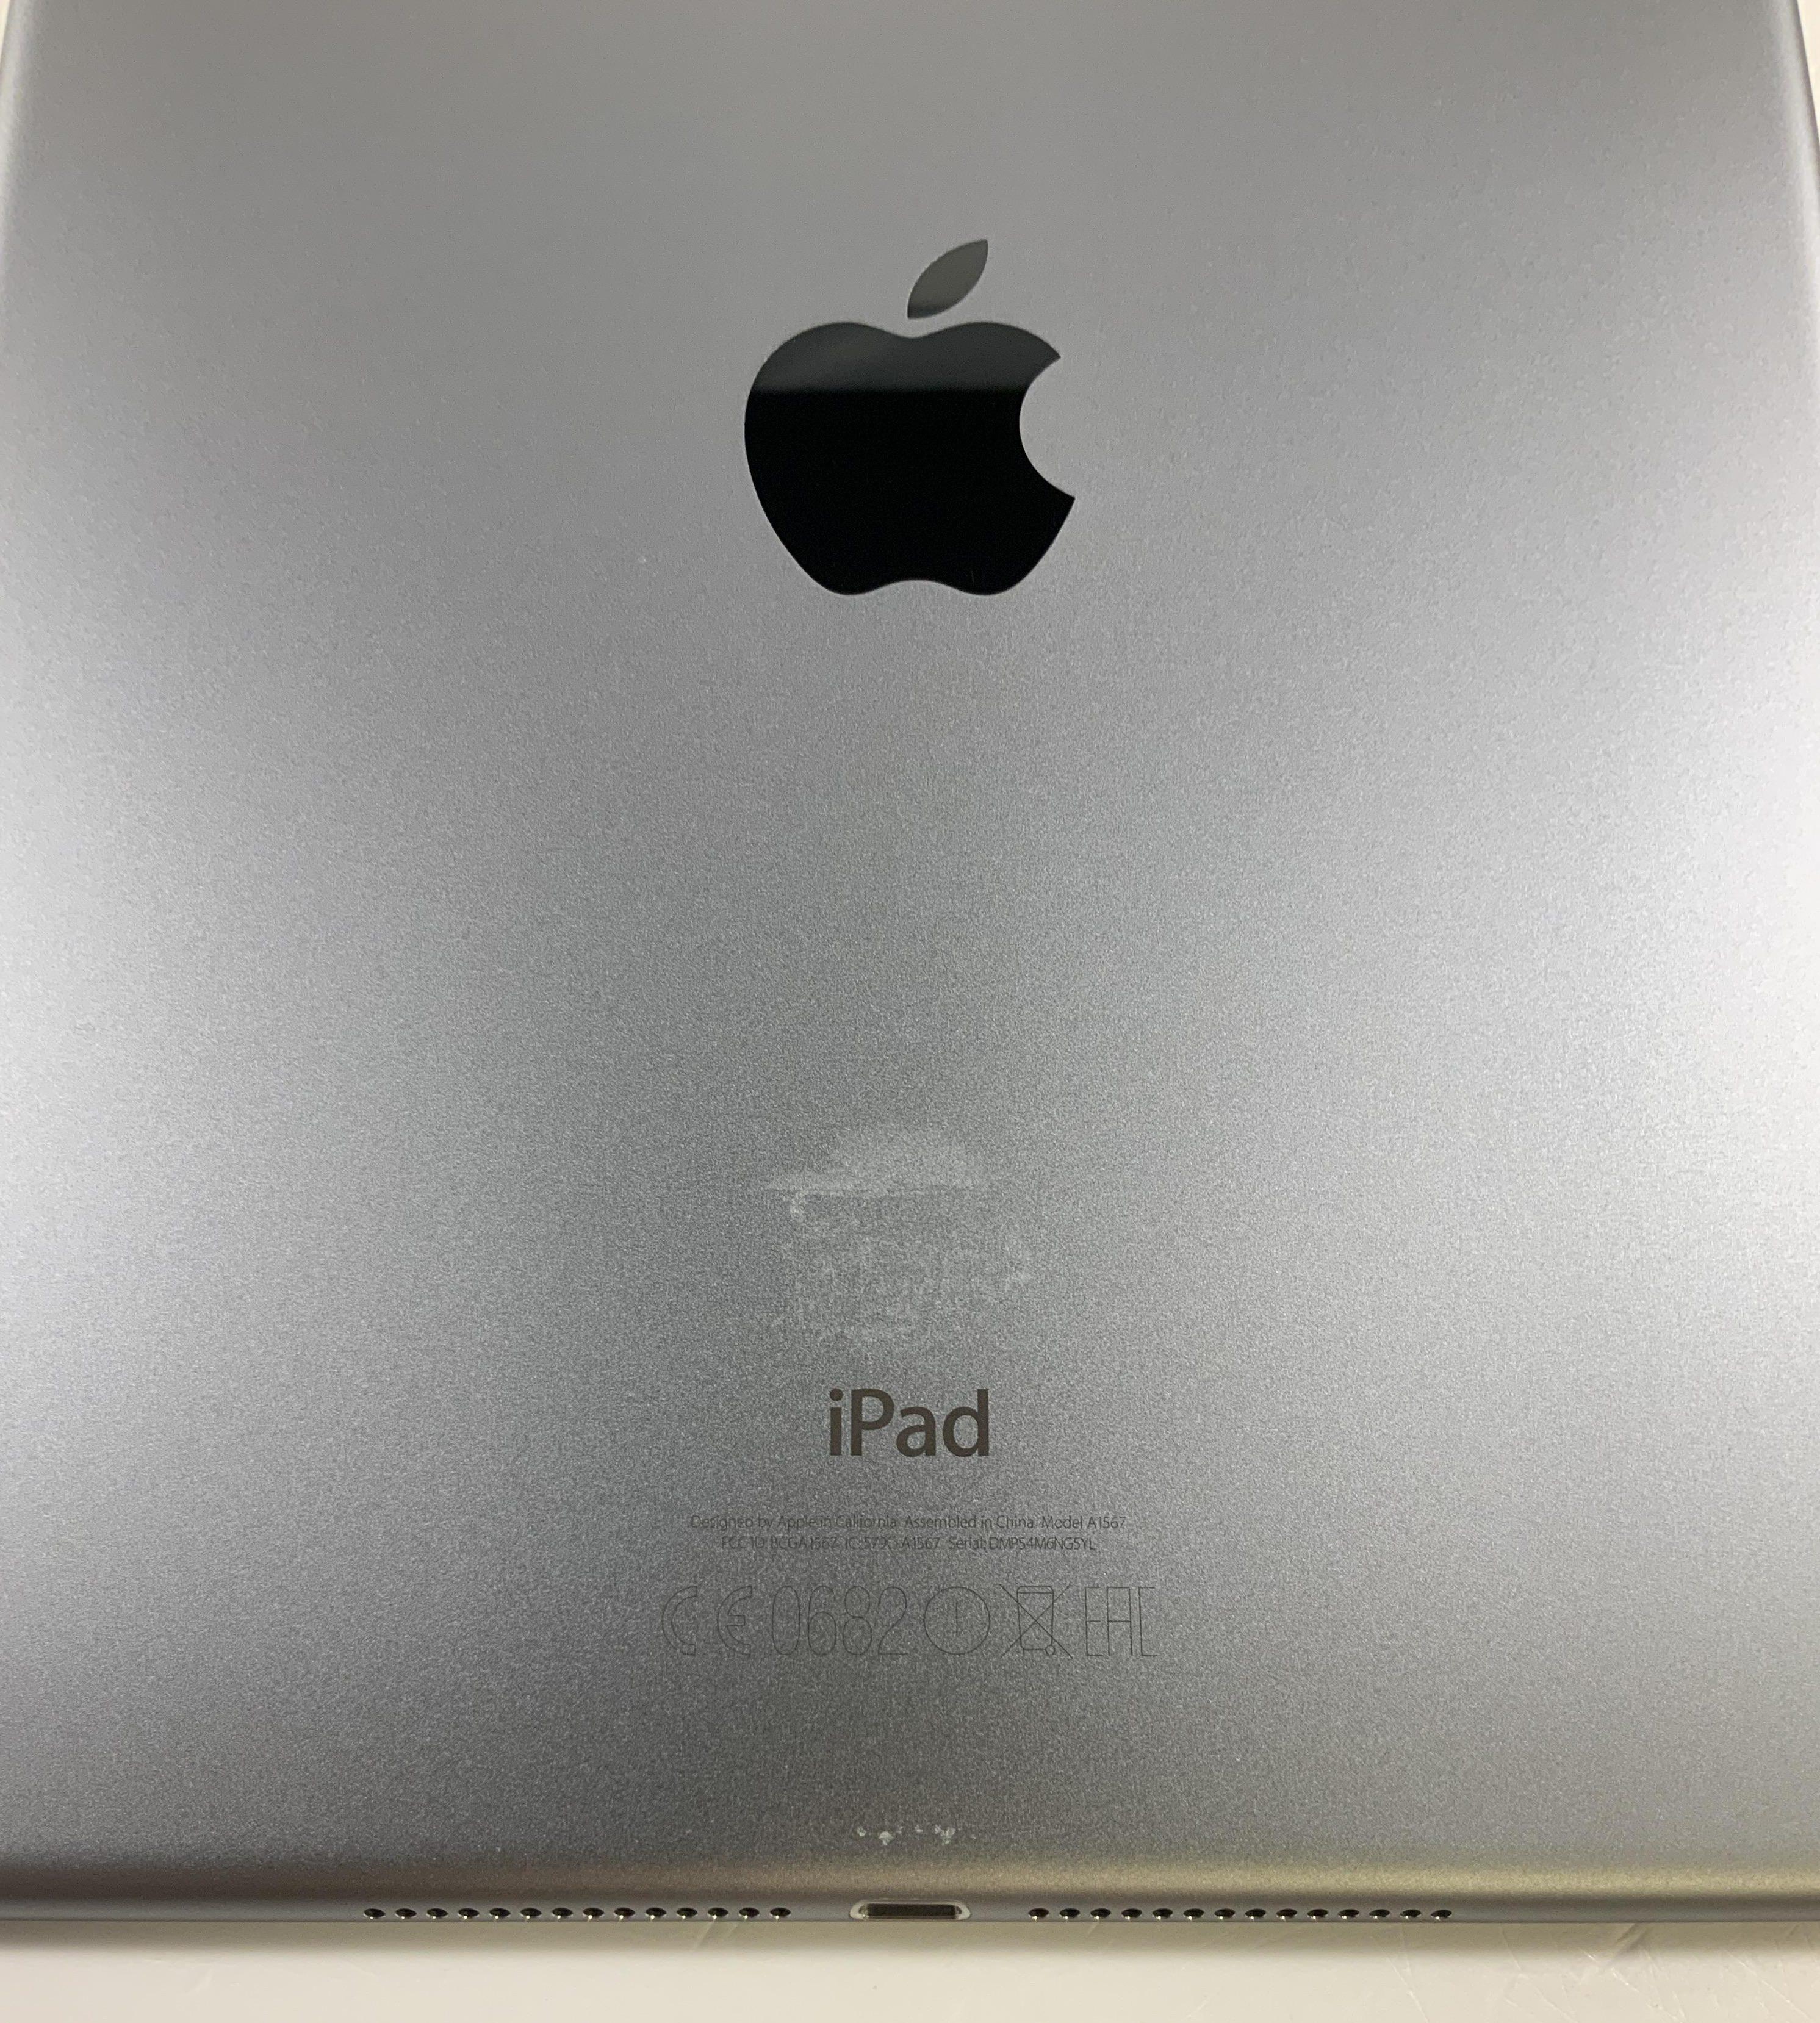 iPad Air 2 Wi-Fi + Cellular 64GB, 64GB, Space Gray, Bild 4